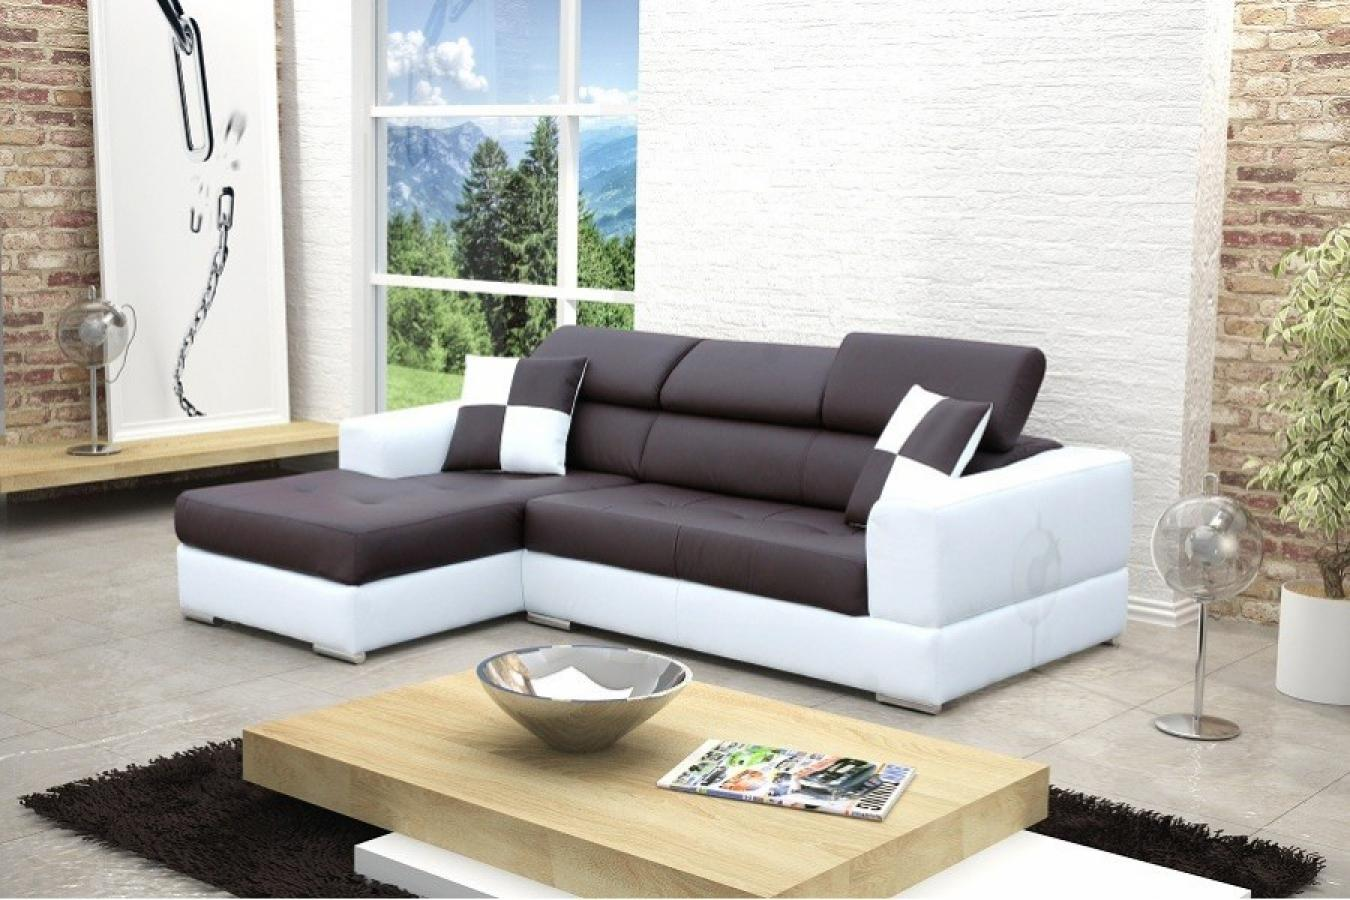 photos canap d 39 angle cuir noir design. Black Bedroom Furniture Sets. Home Design Ideas